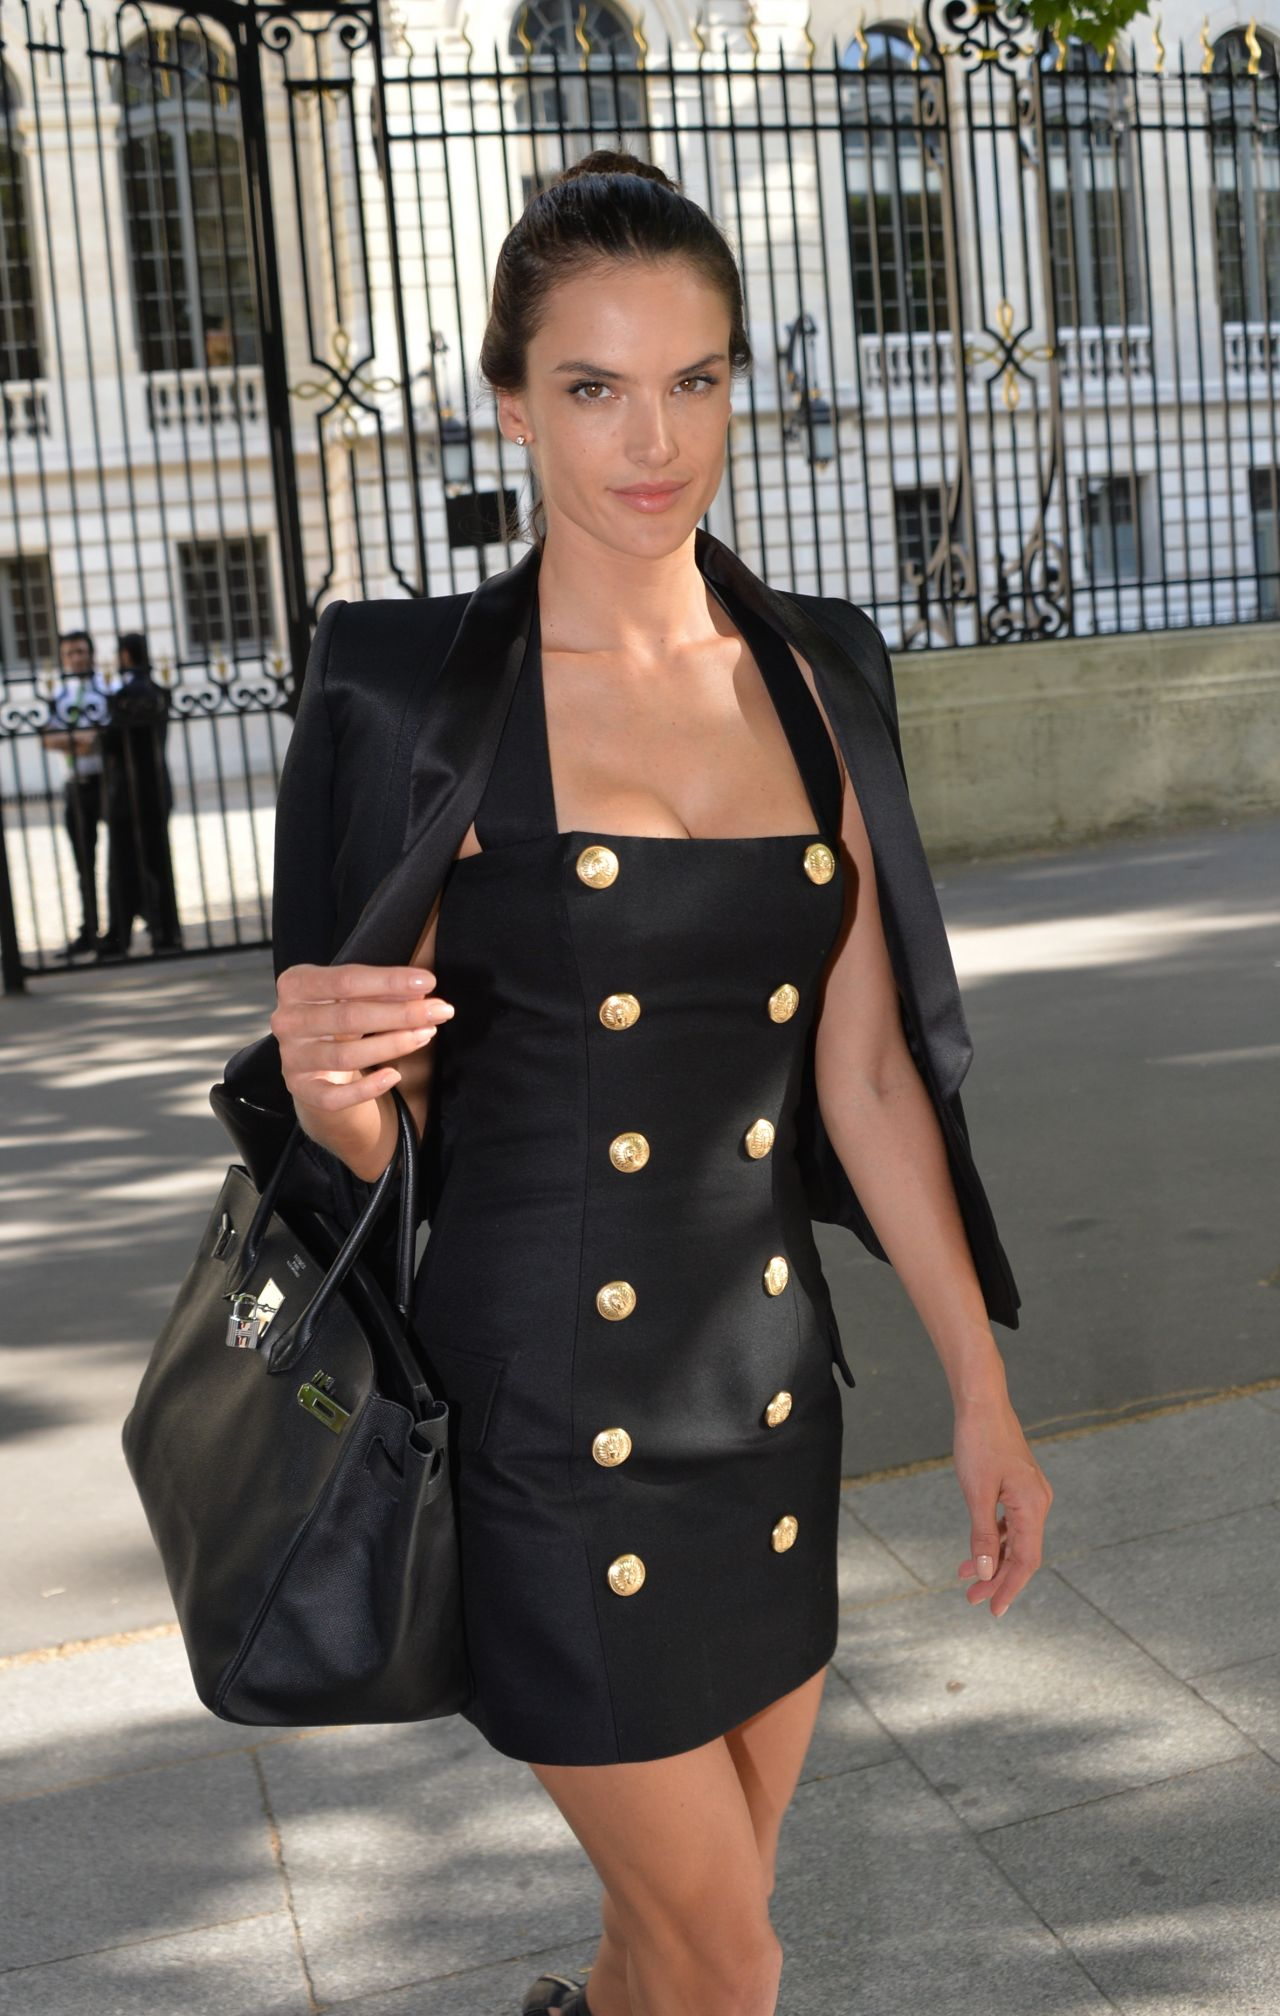 Ambrosio - Balmain Fashion Show in Paris, June 2015